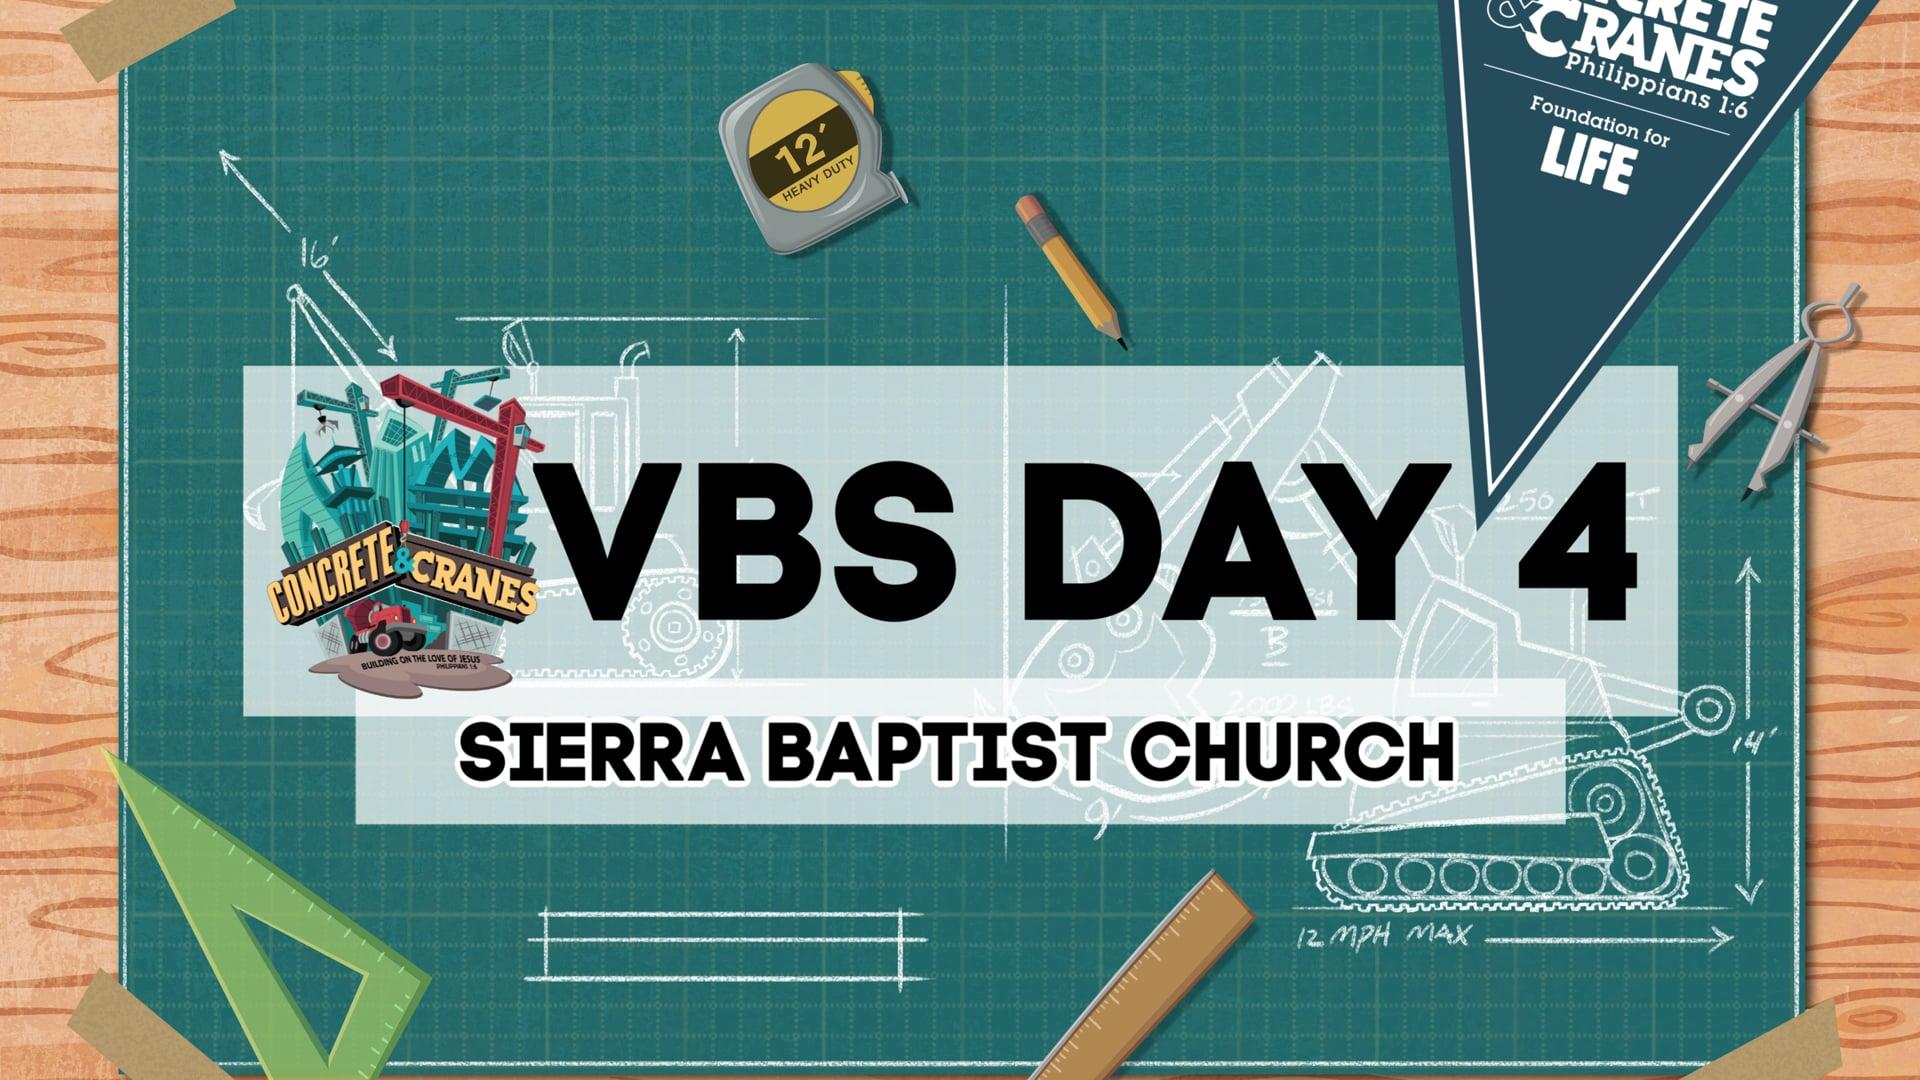 VBS Day 4 - Concrete & Cranes at Sierra Baptist Church